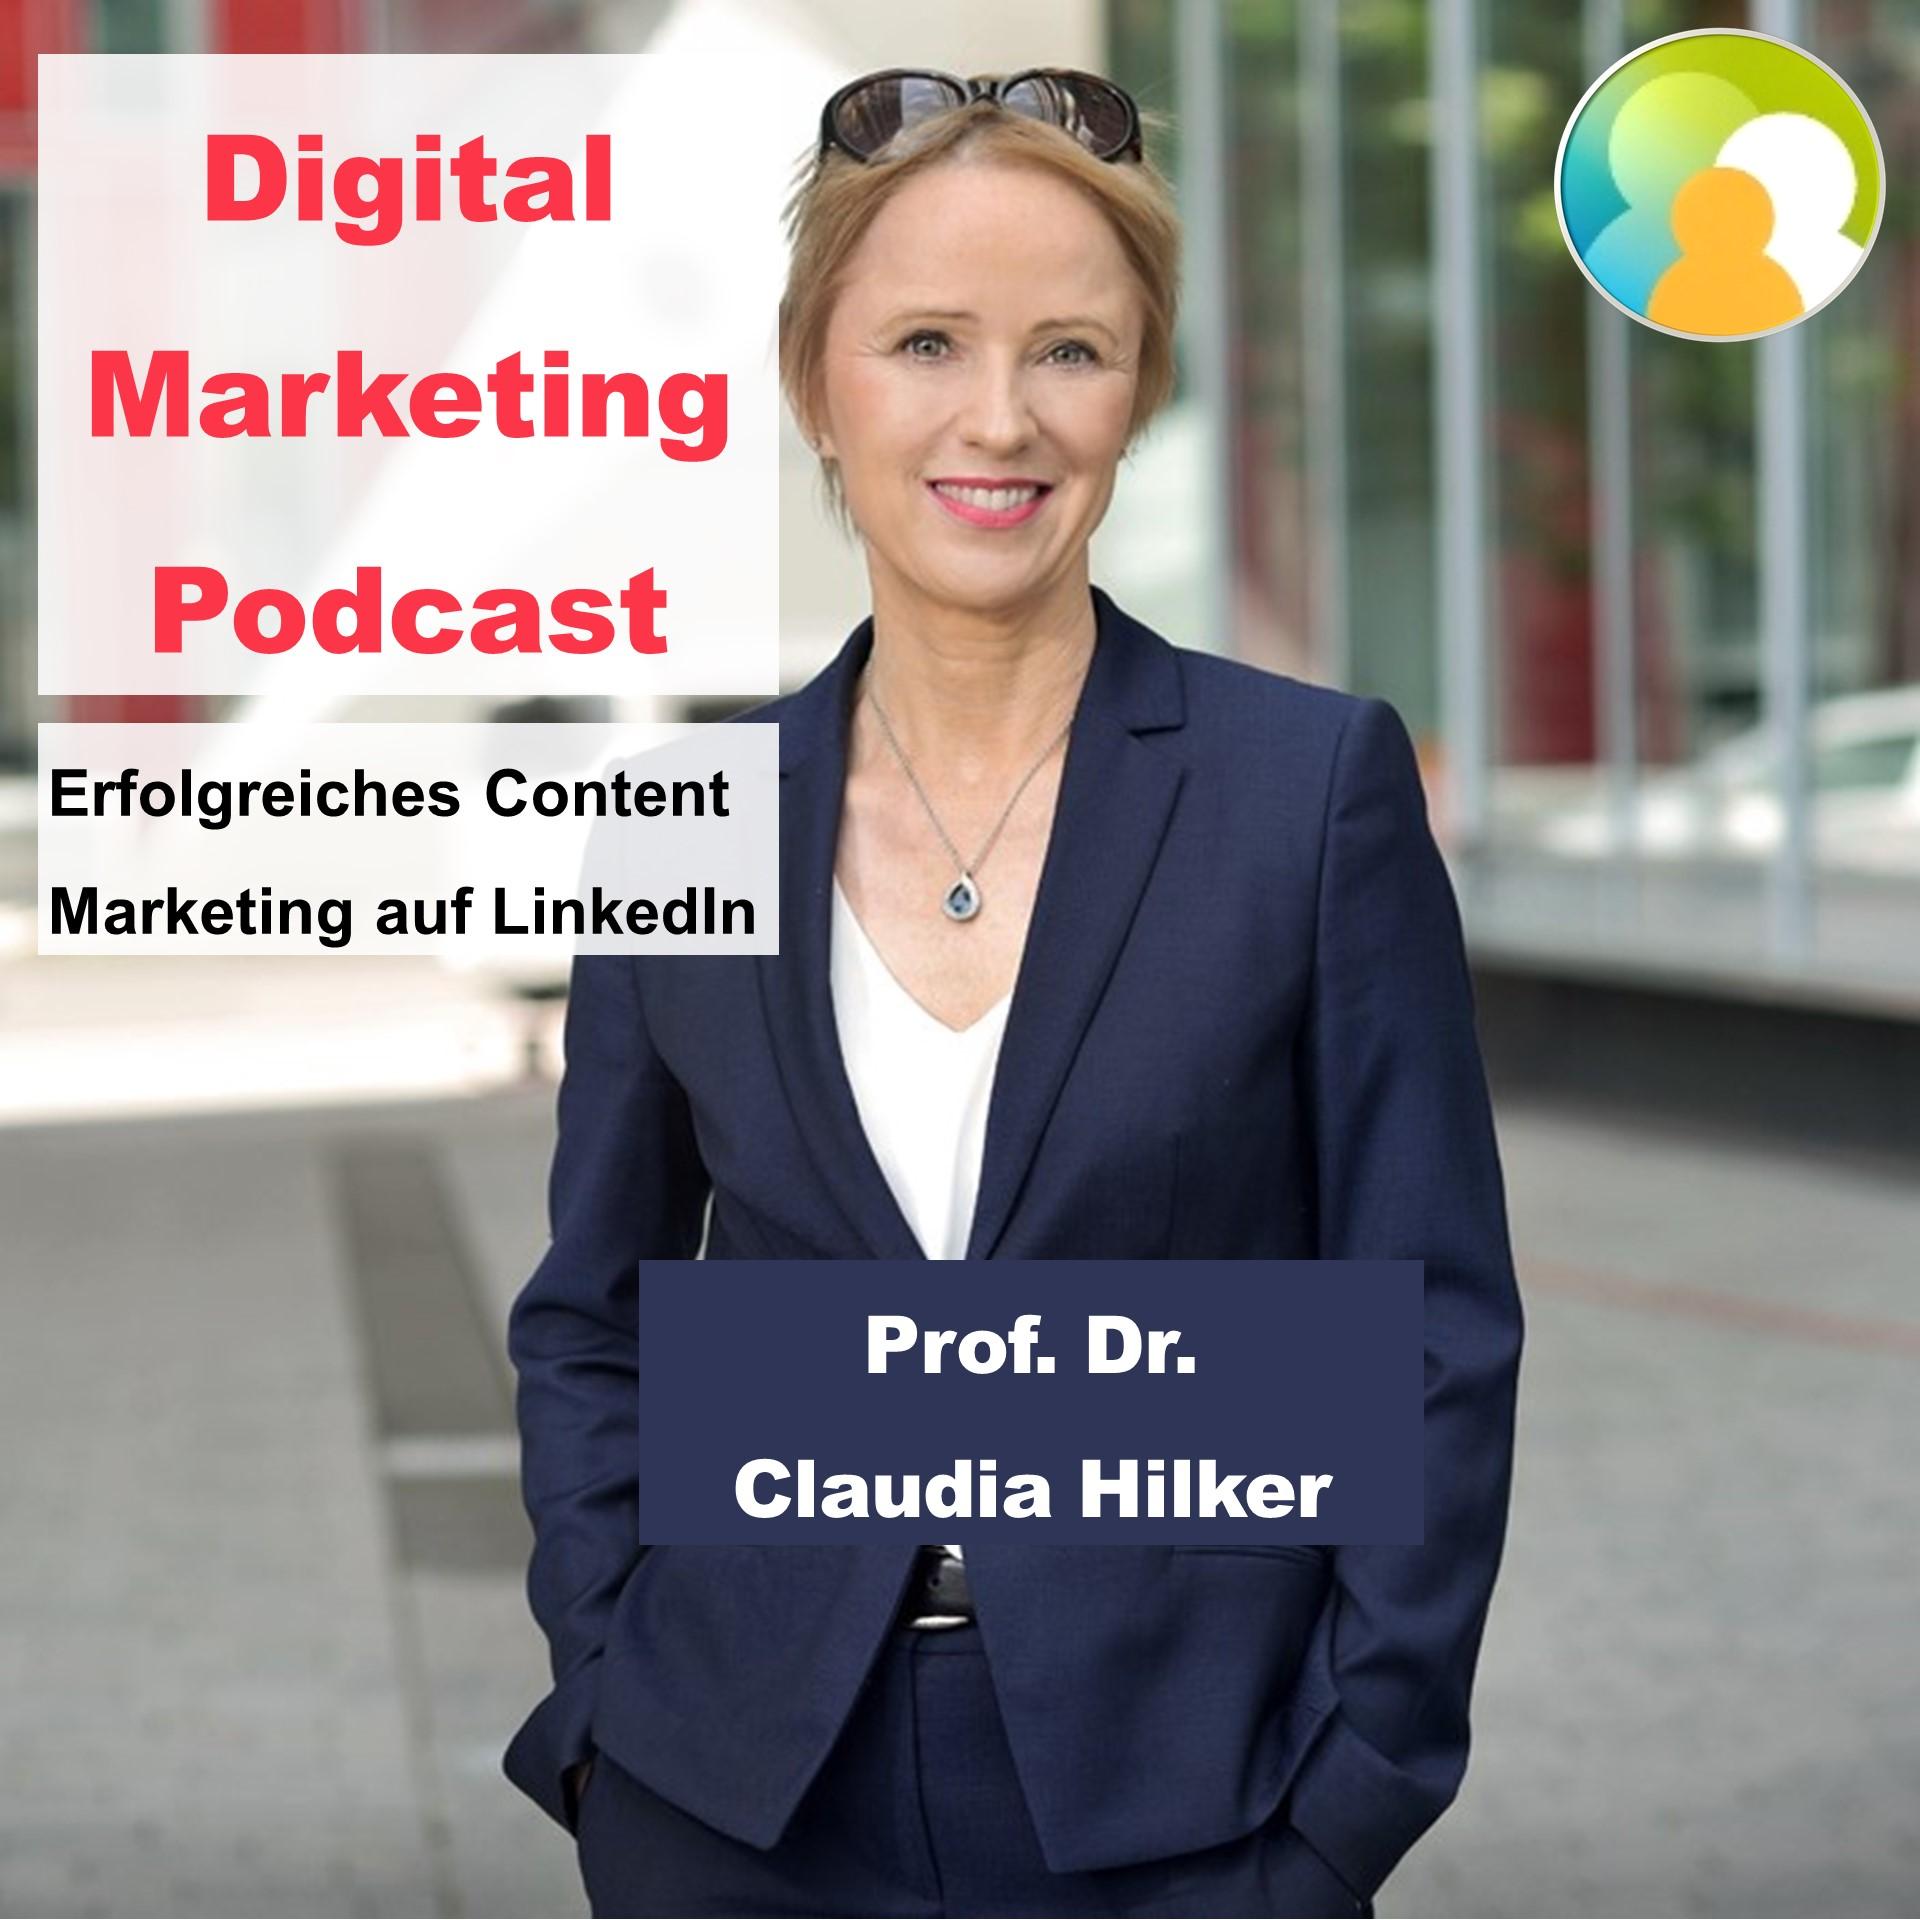 Podcast Digital Marketing